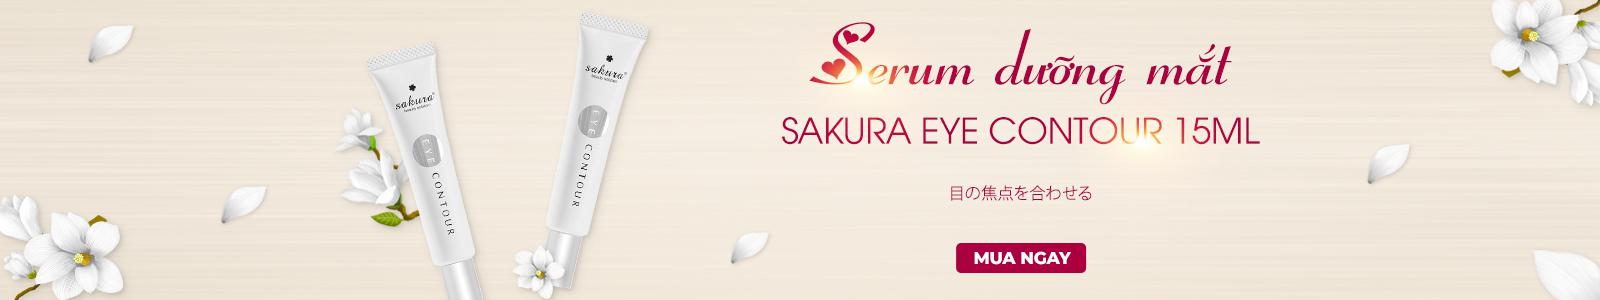 Serum dưỡng mắt Sakura Eye Contour